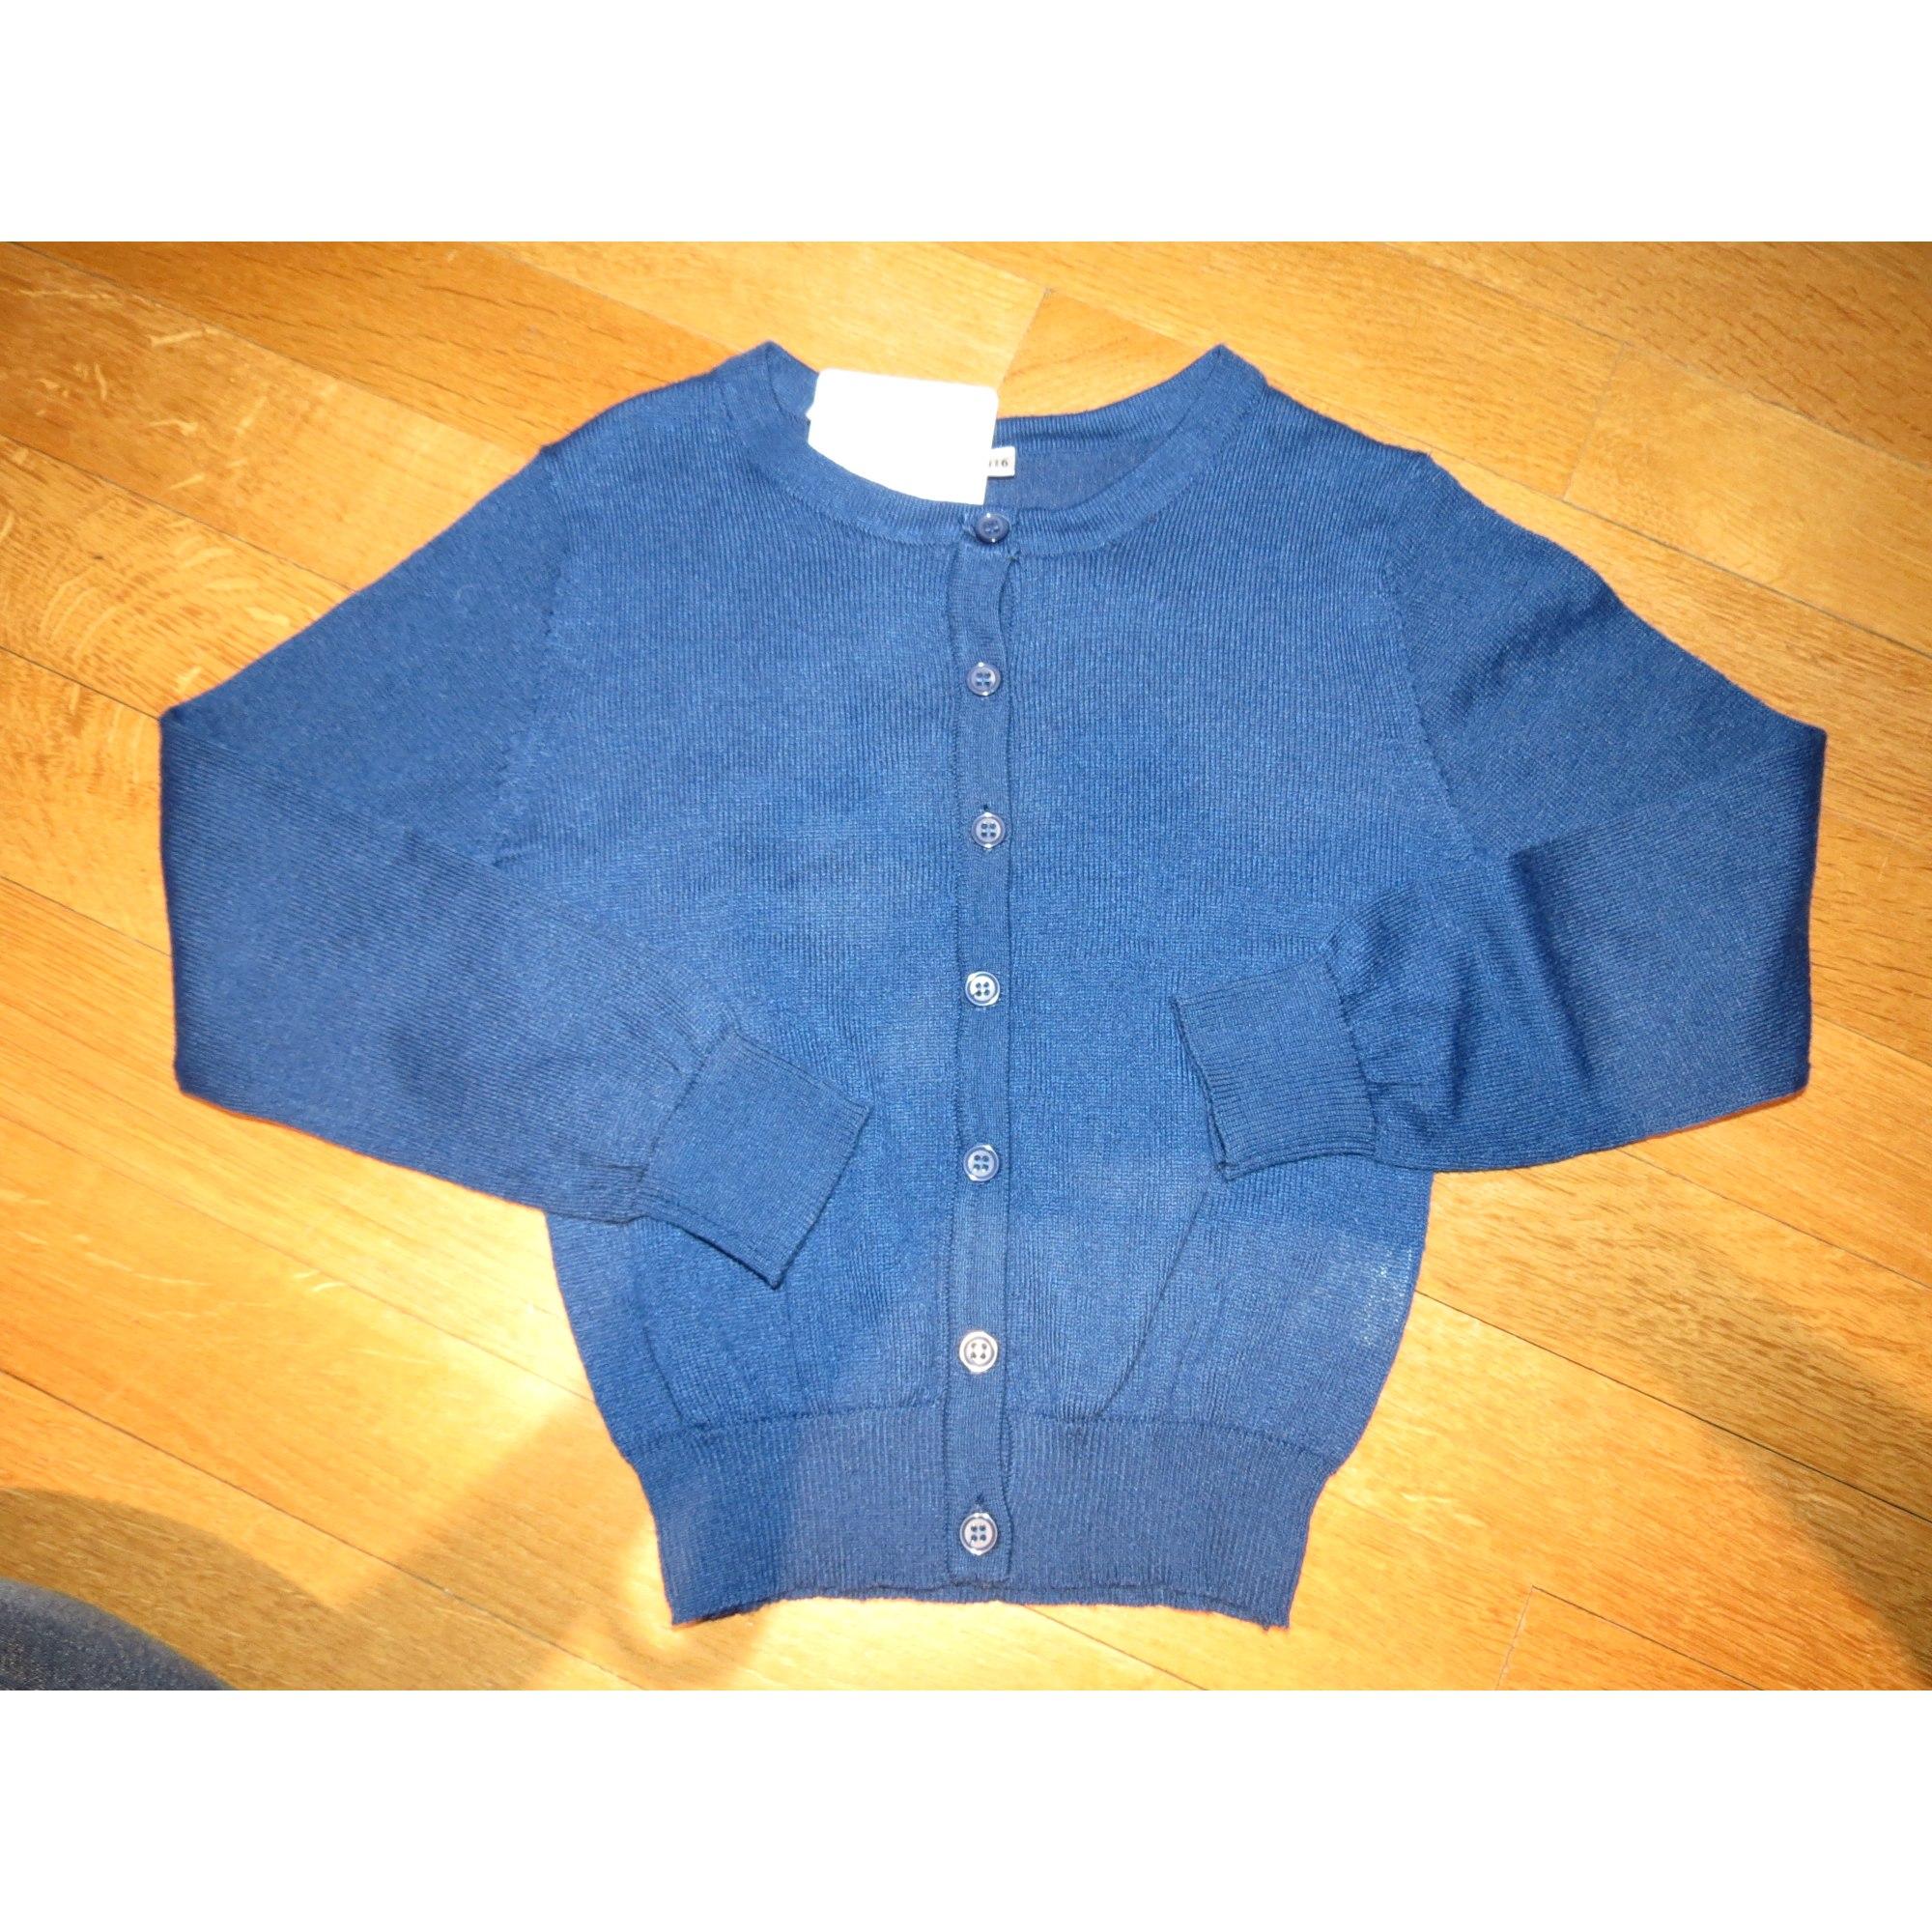 Gilet, cardigan MARQUE INCONNUE Bleu, bleu marine, bleu turquoise